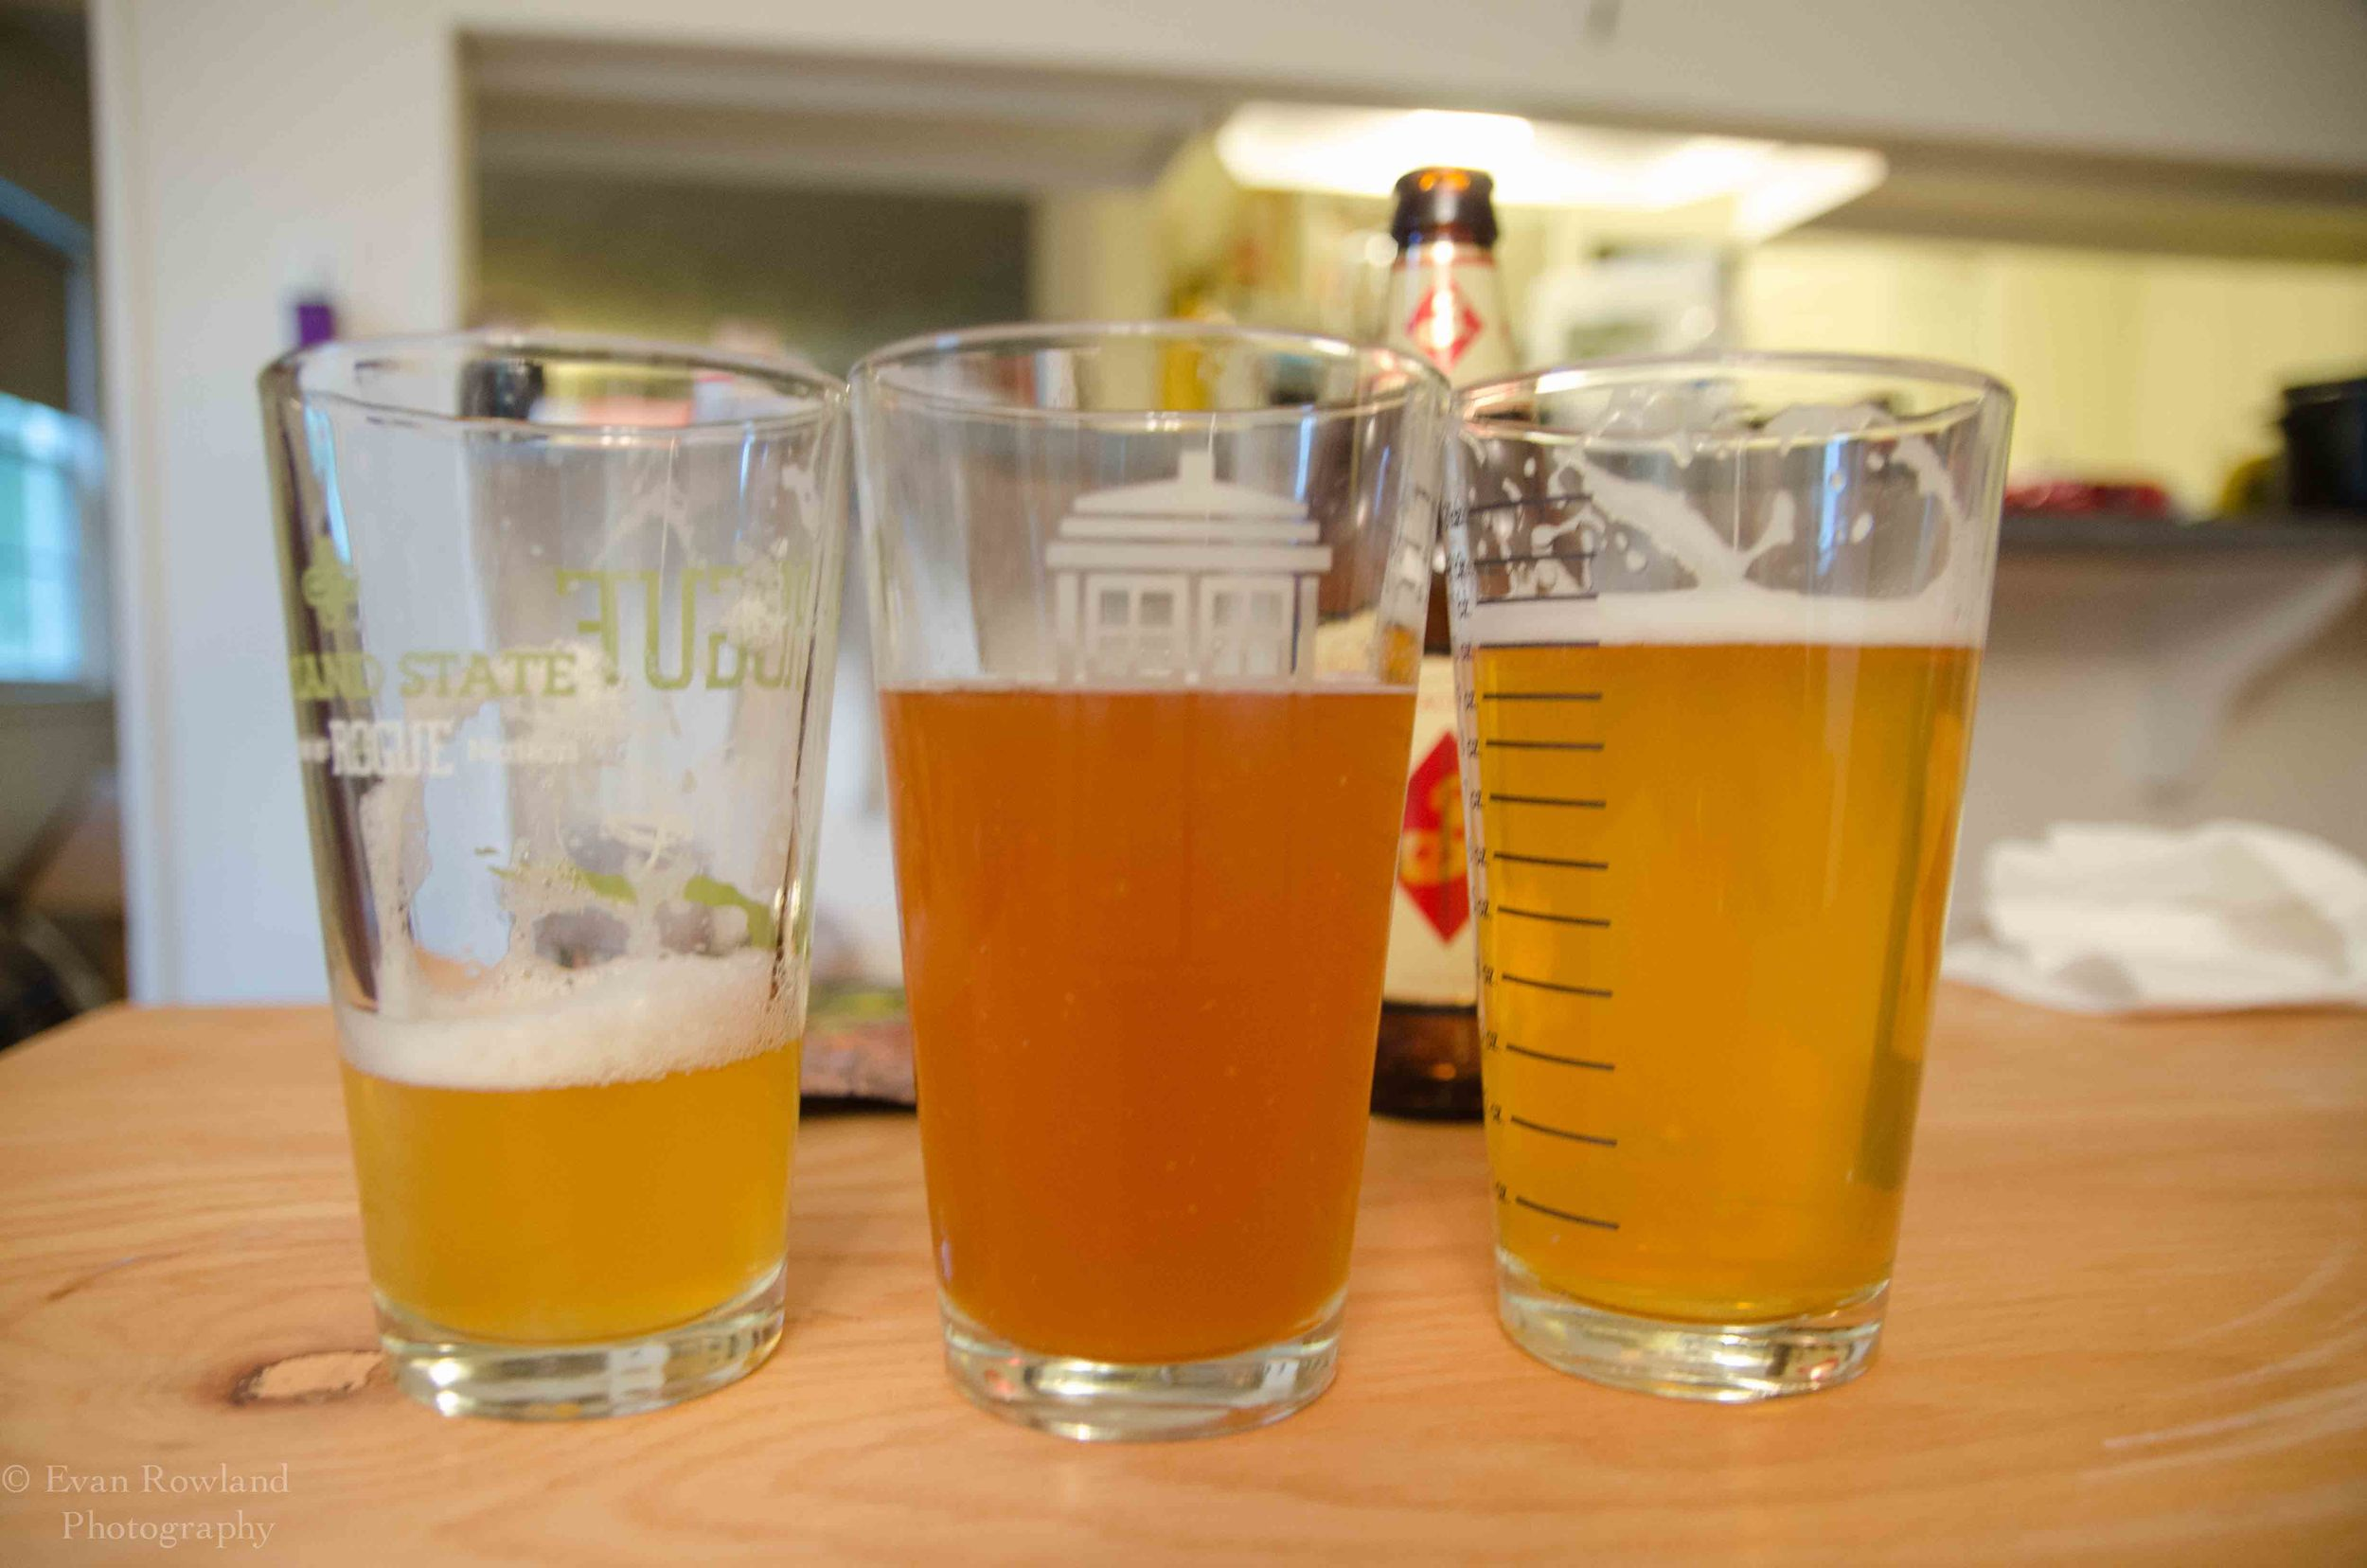 Large format sorachi ace on left, propose ale middle, 12 oz bottle right